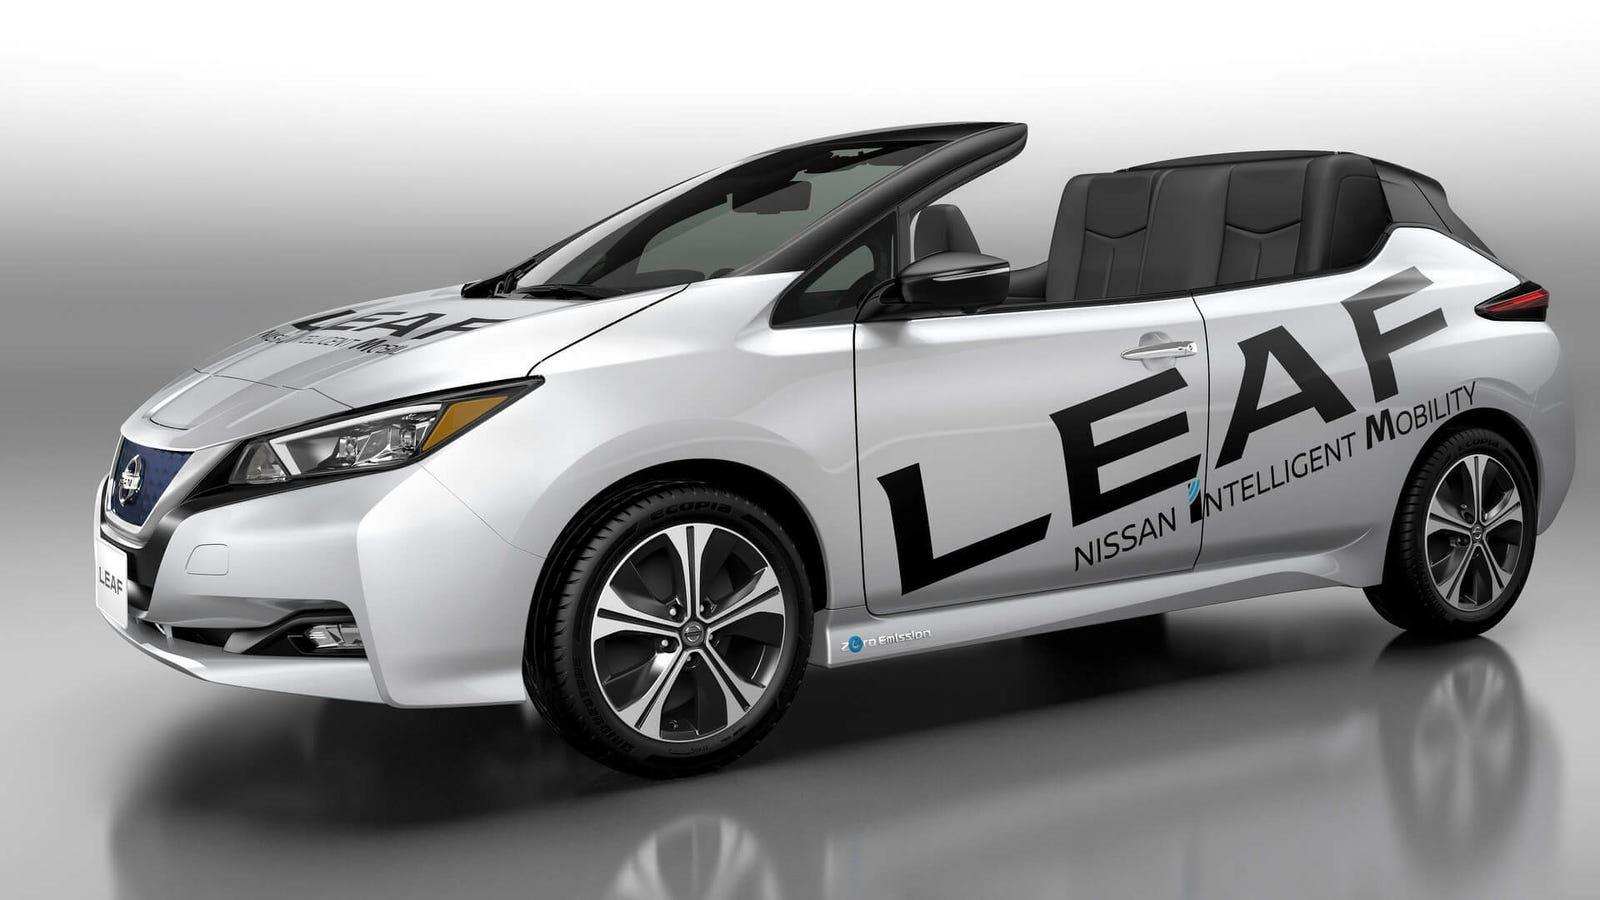 Nissan Leaf Convertible: Good